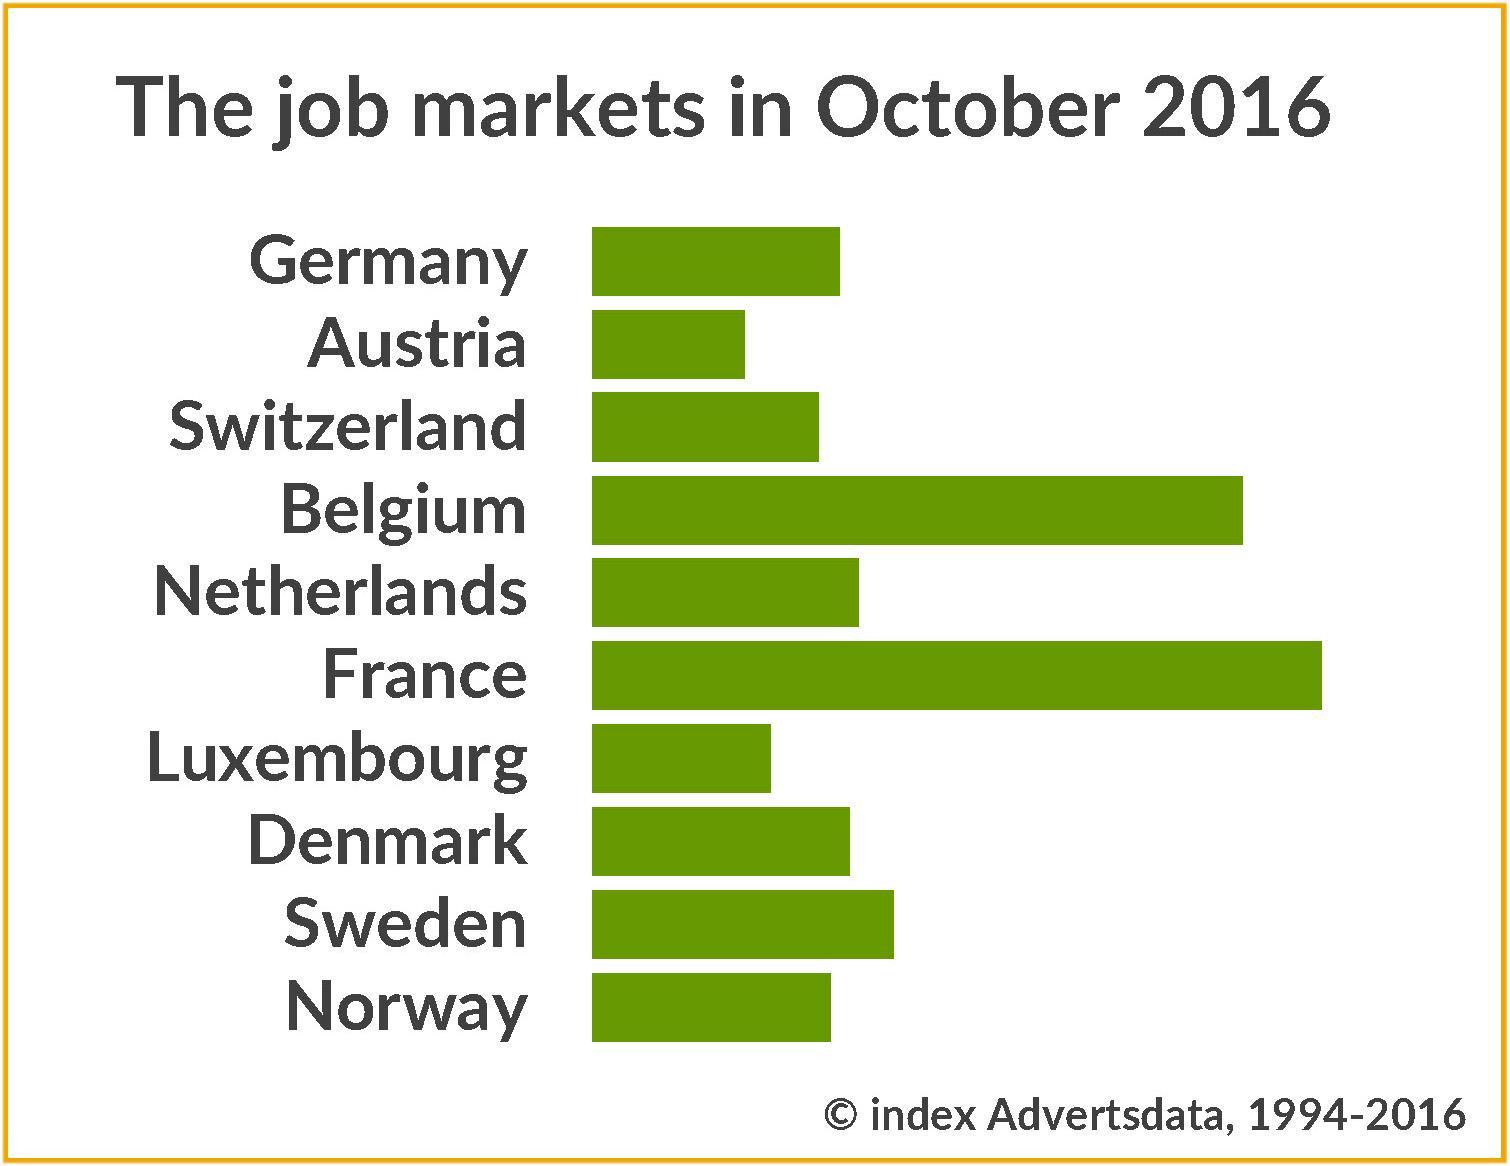 Development of the job markets